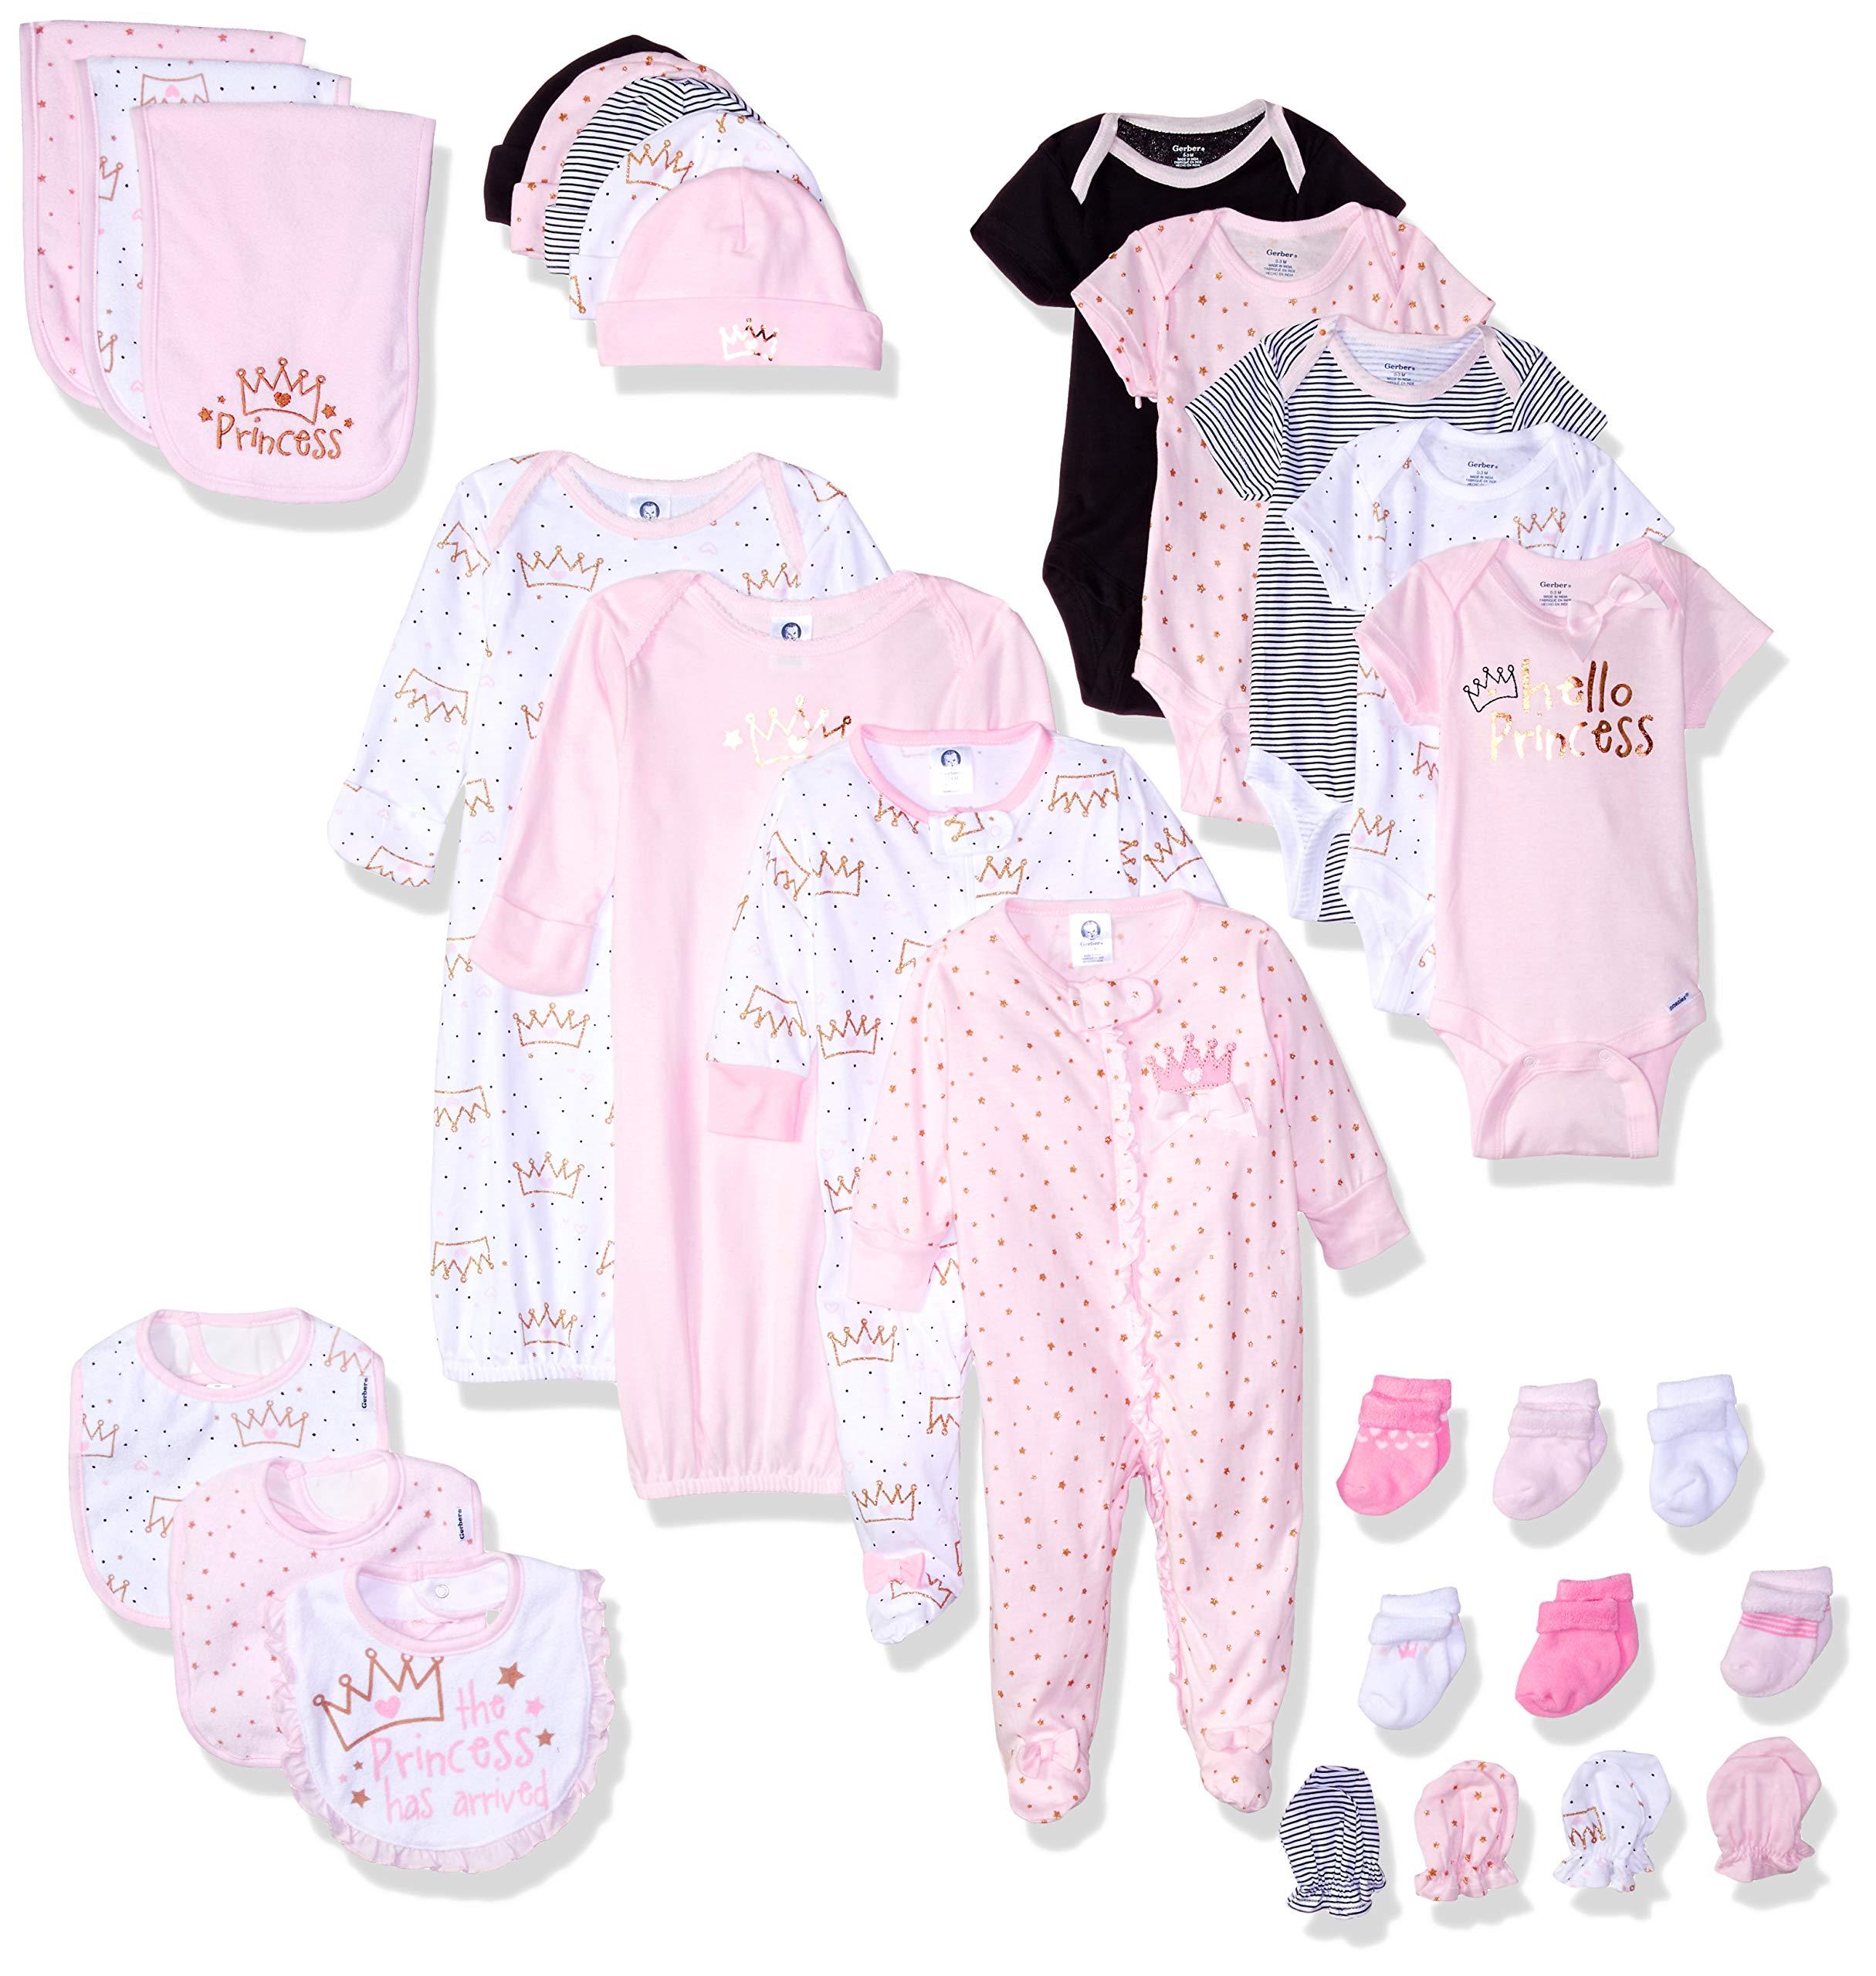 Gerber Baby 30-Piece Essentials Gift Set, Princess Crown, Newborn Assorted Sizes by Gerber